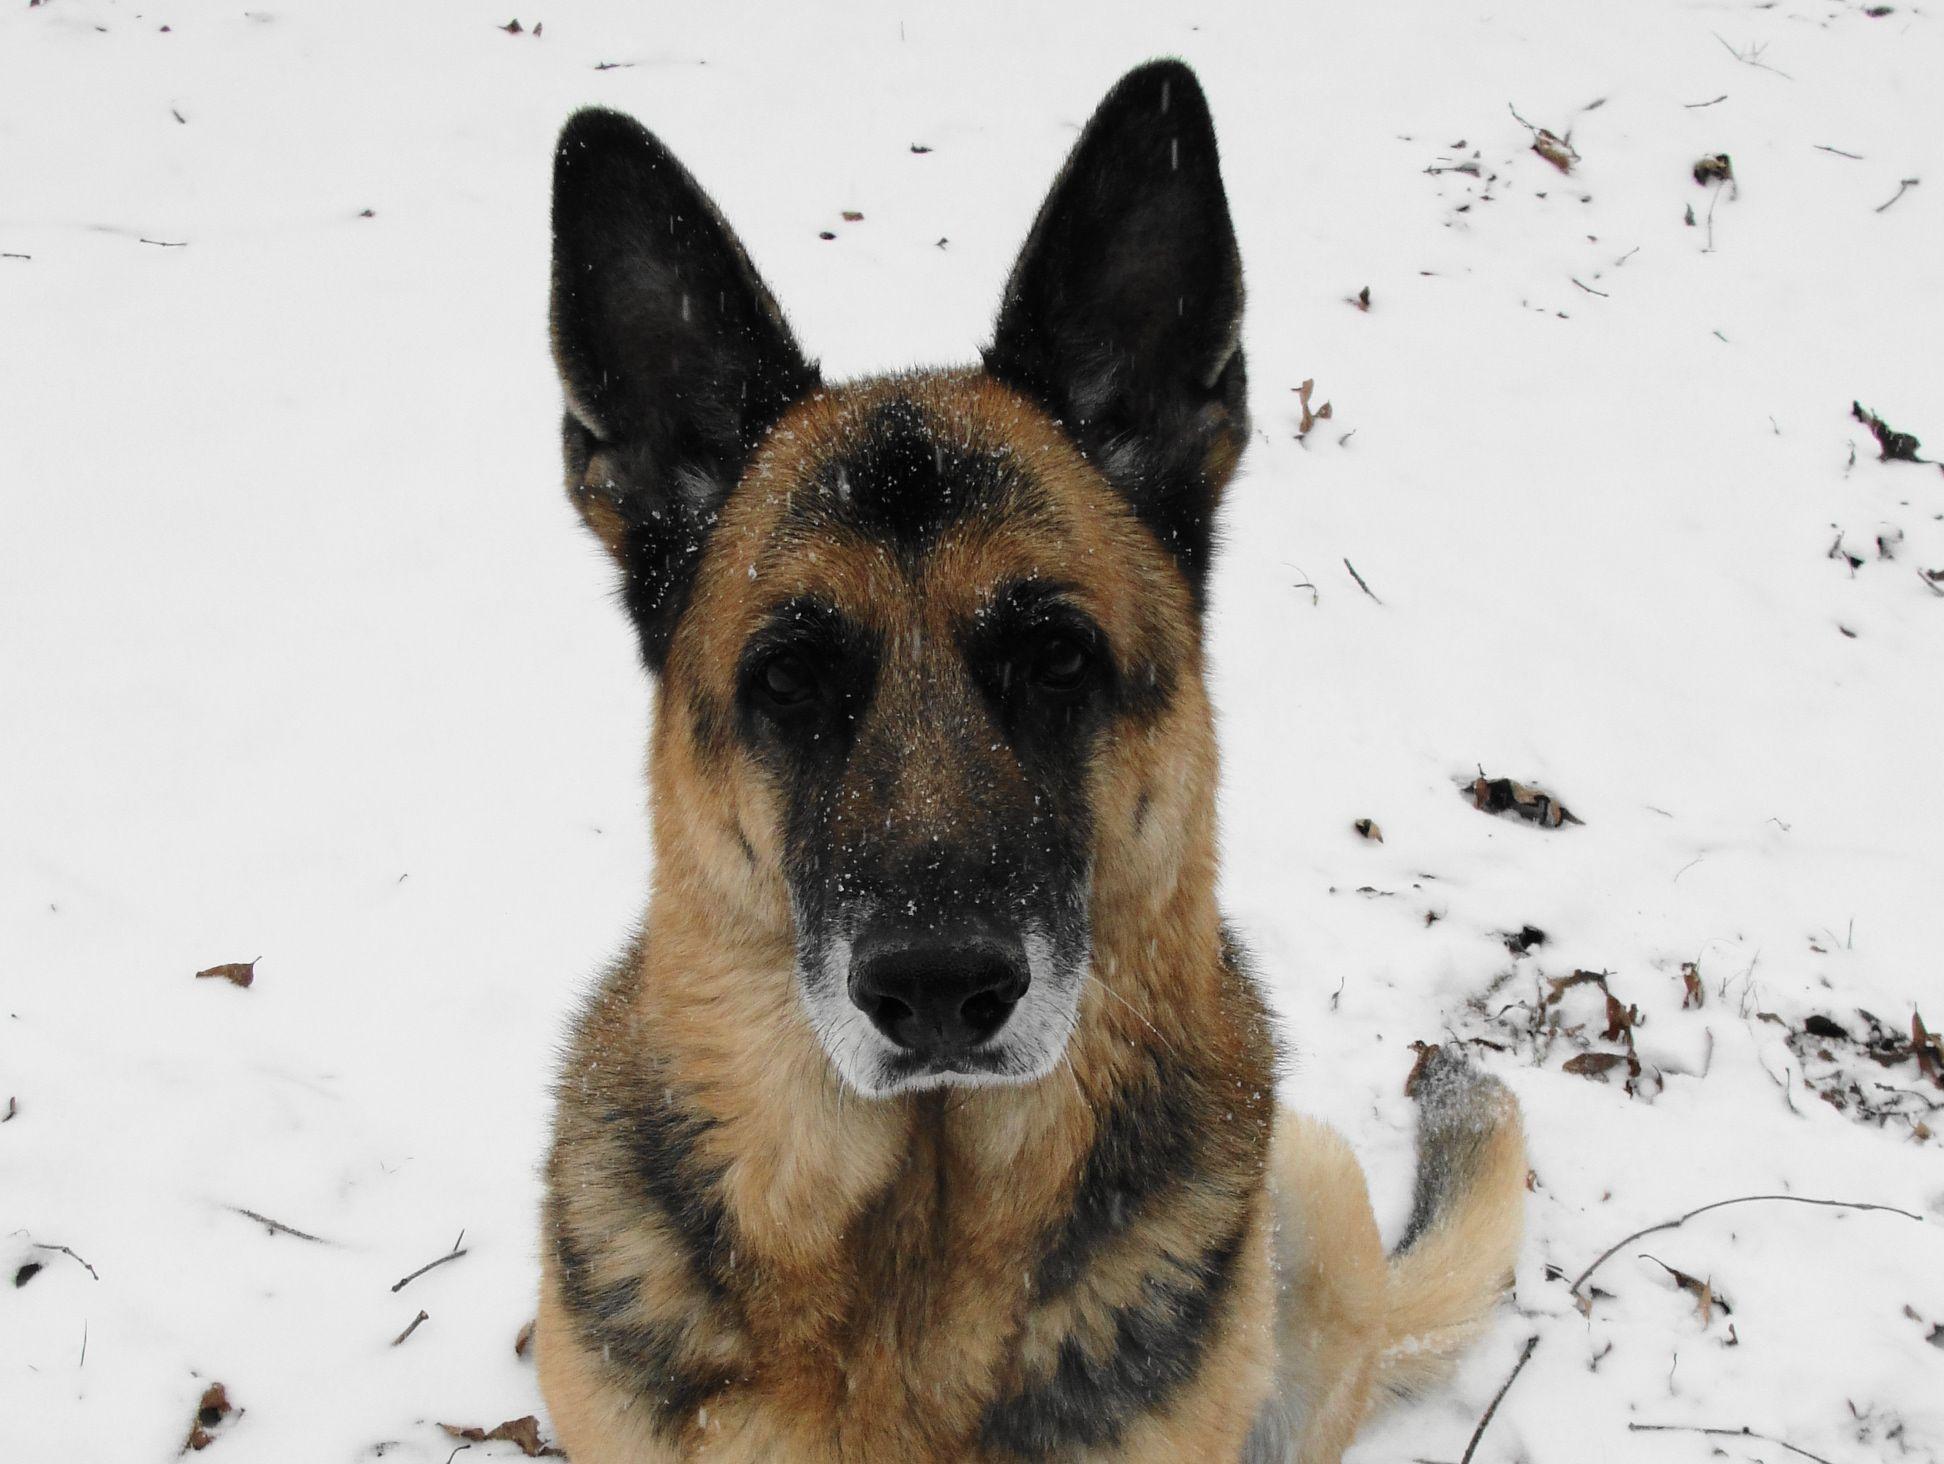 German Shepherd Dusty in Snow 2014! German